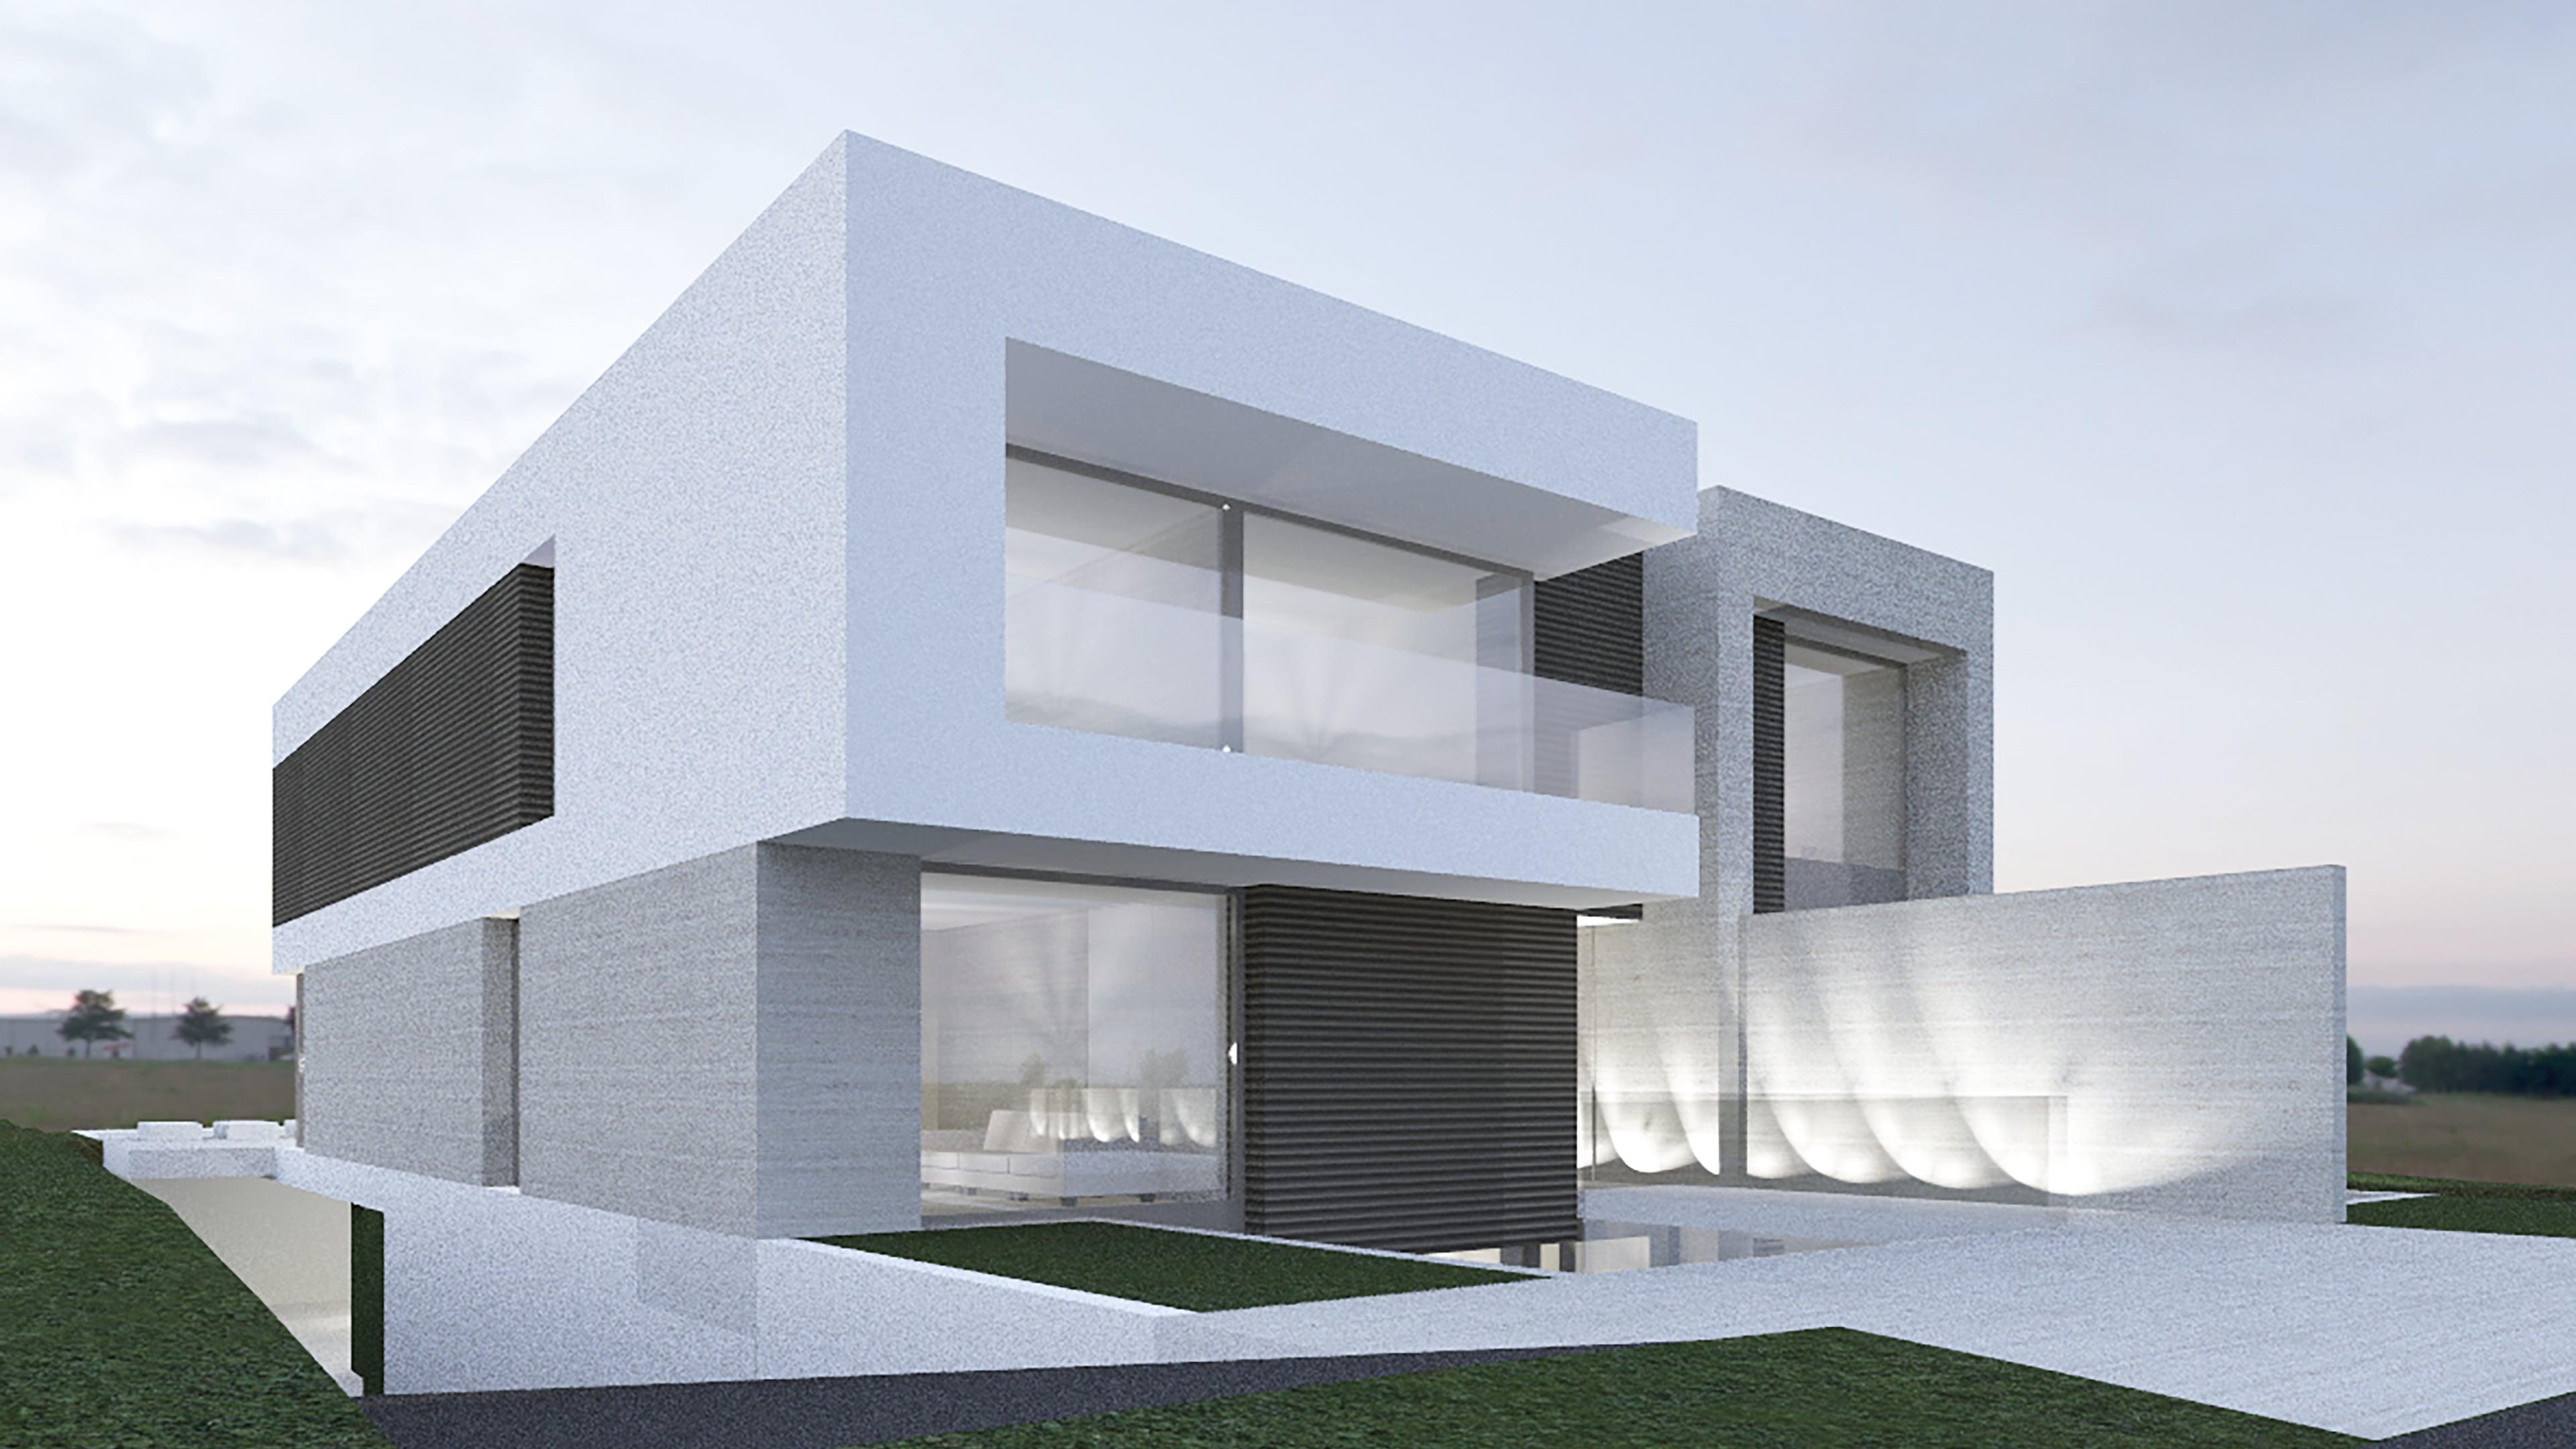 124-luxembourg-bridel-villa-house-luxe-luxury-pierre-stone-architecture-cfa-cfarchitectes-architecte-architect-investment-01